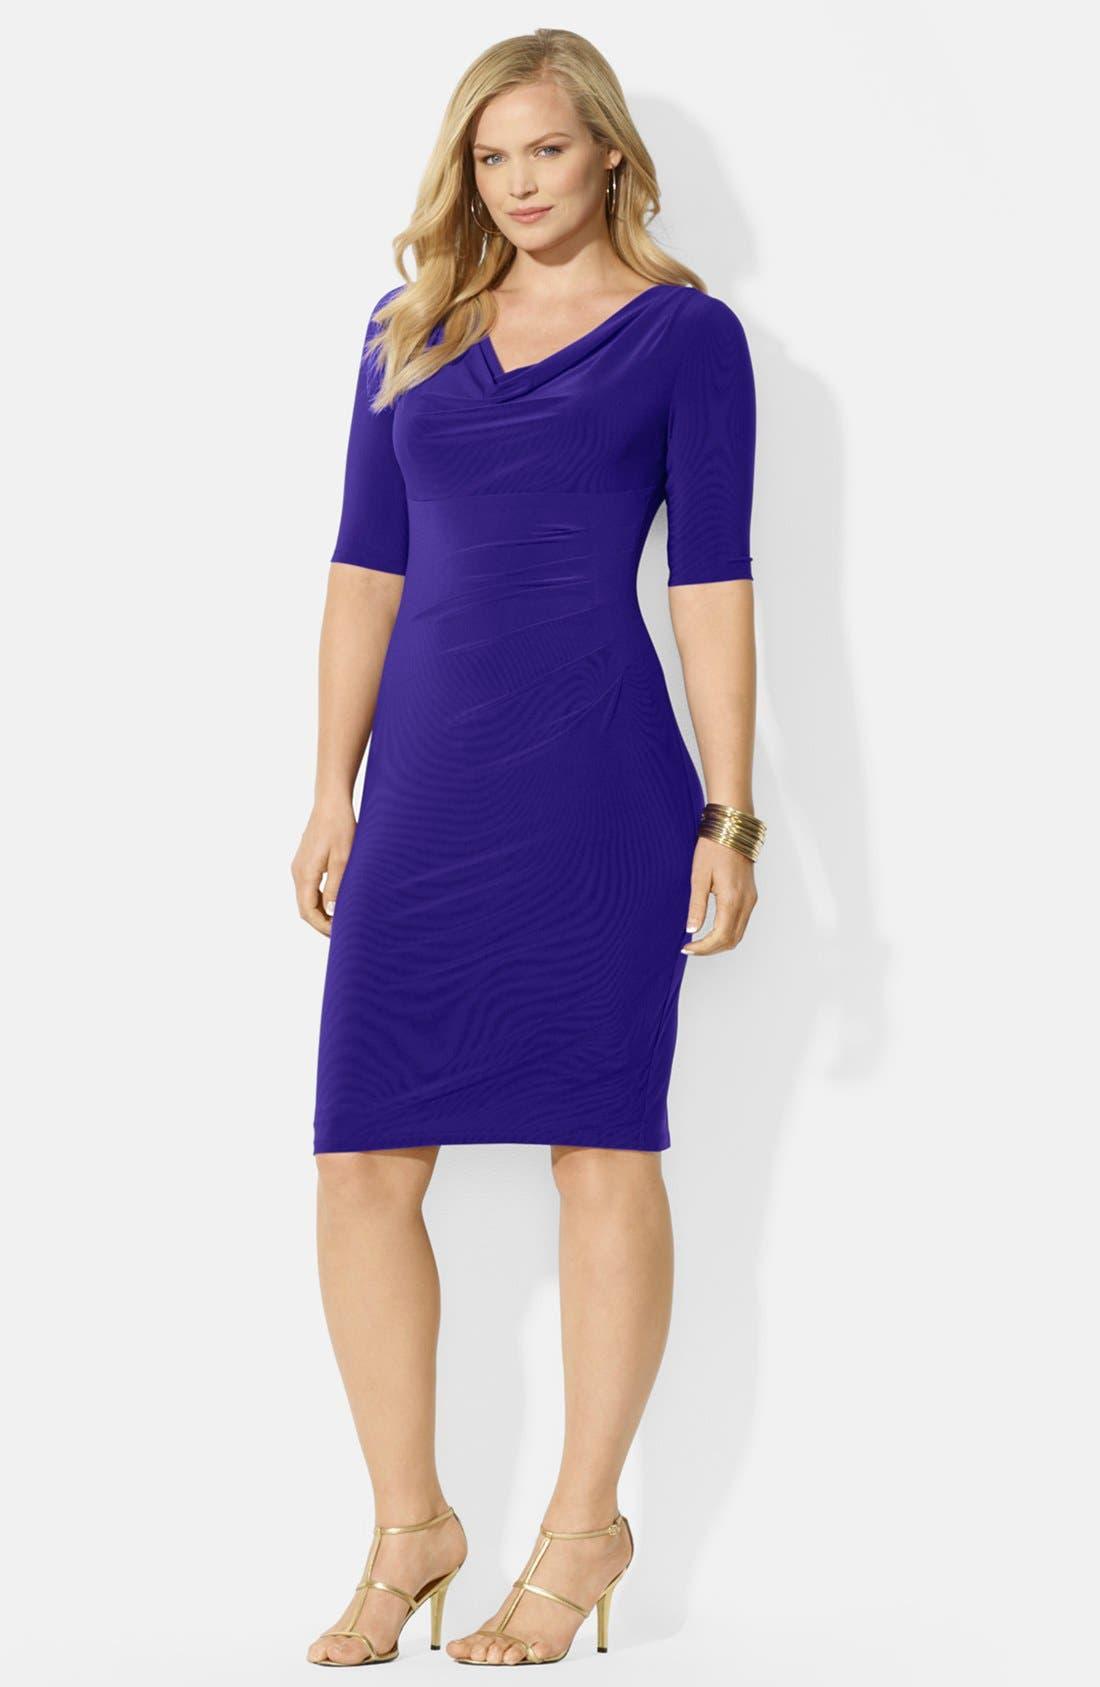 Alternate Image 1 Selected - Lauren Ralph Lauren Cowl Neck Matte Jersey Dress (Plus Size)